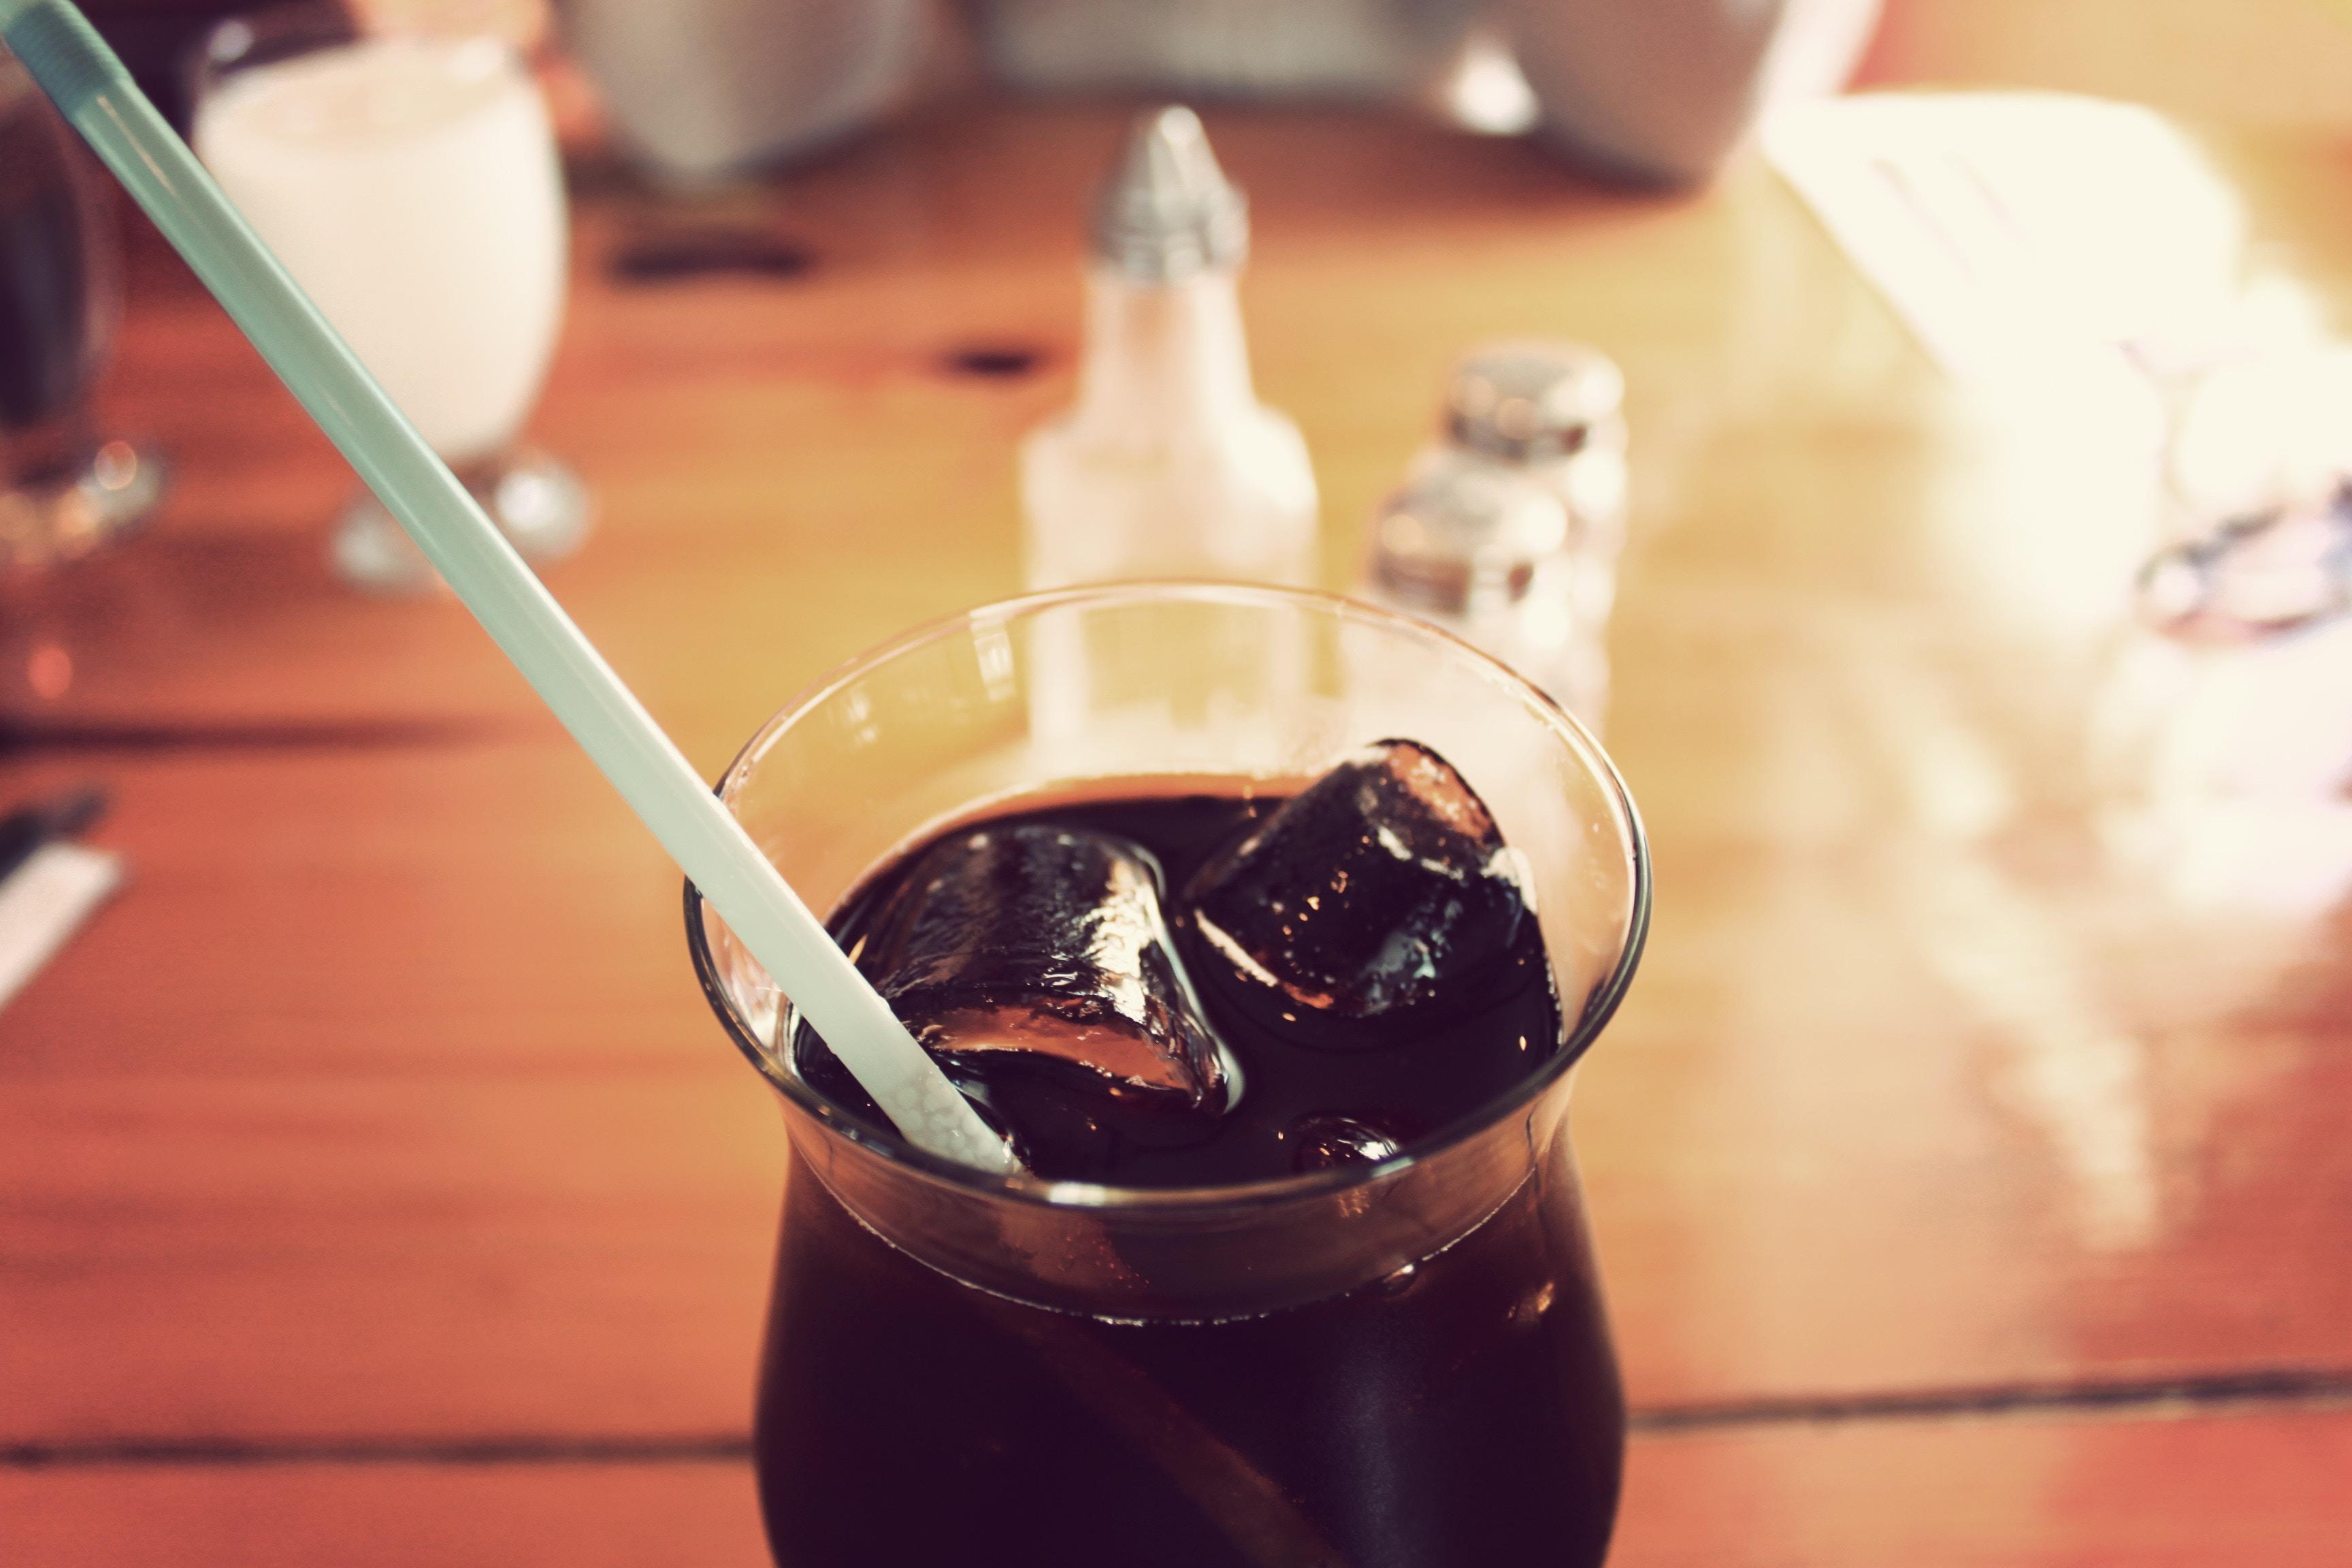 Do Artificial Sweeteners Cause Cavities?